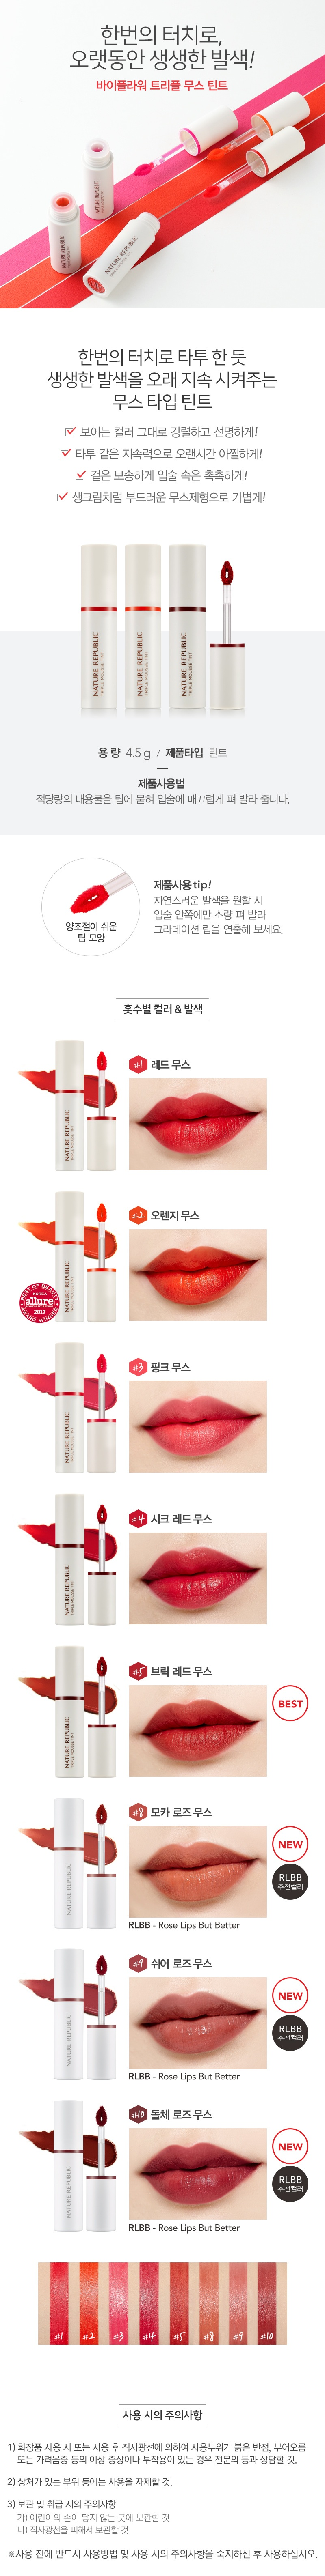 Nature Republic By Flower Triple Mousse Tint korean makeup product online shop malaysia macau singapore1